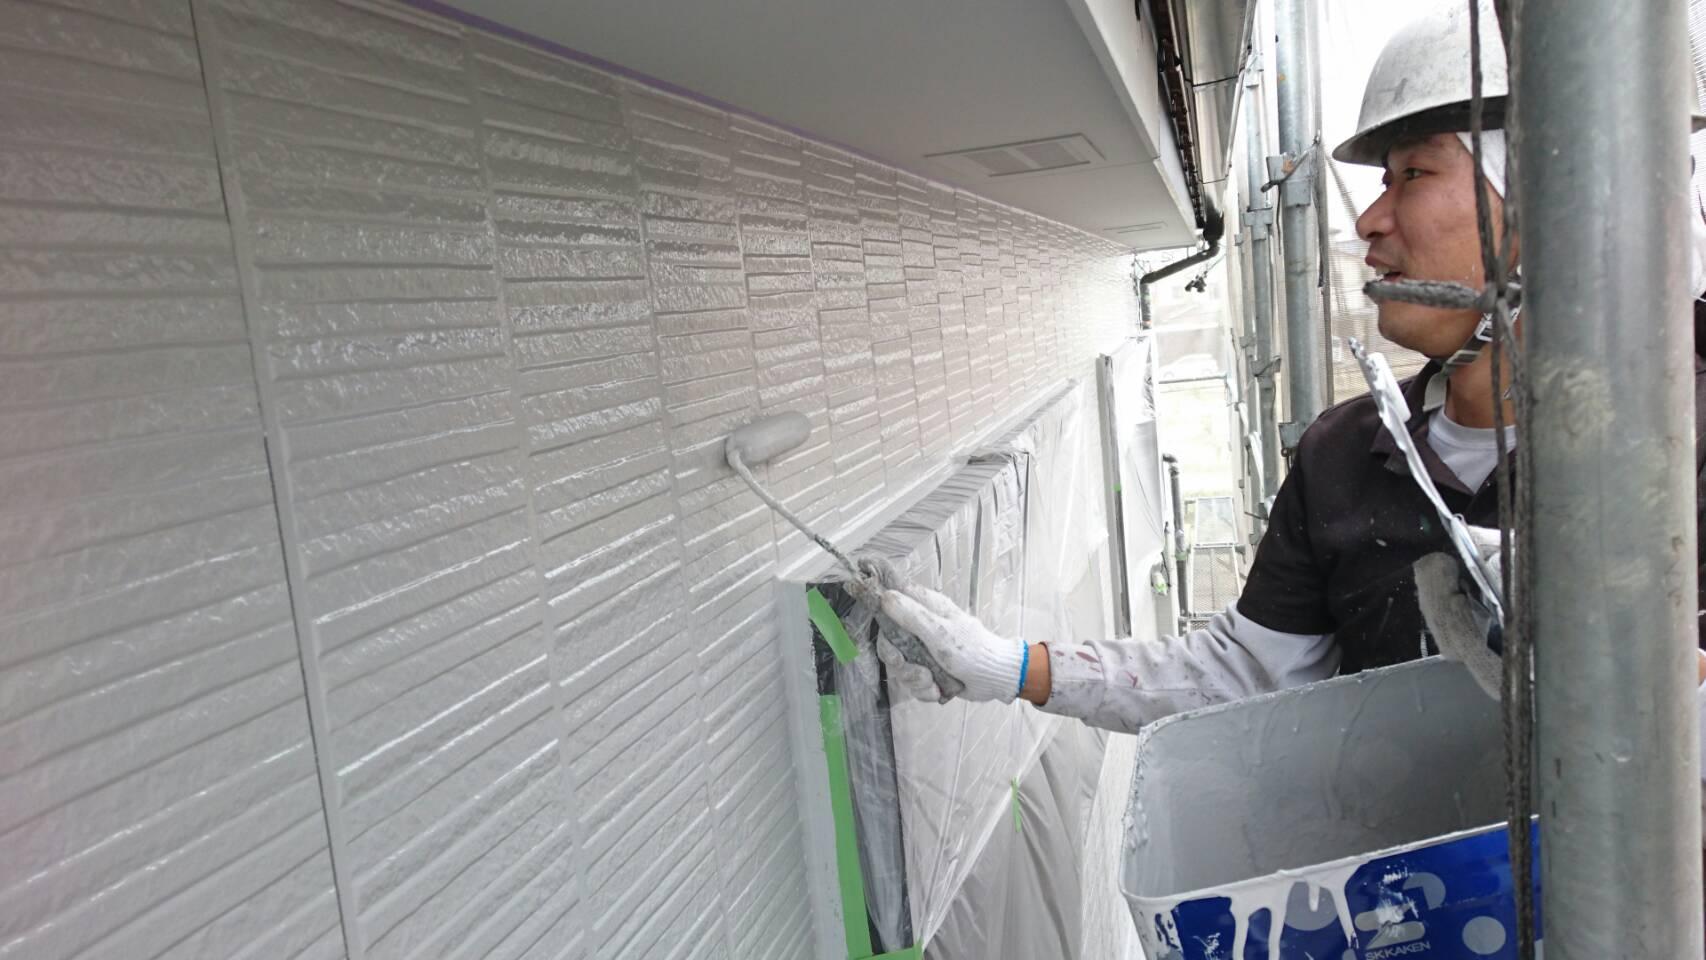 春日井市大手町N様邸 フッ素樹脂塗装完了です。